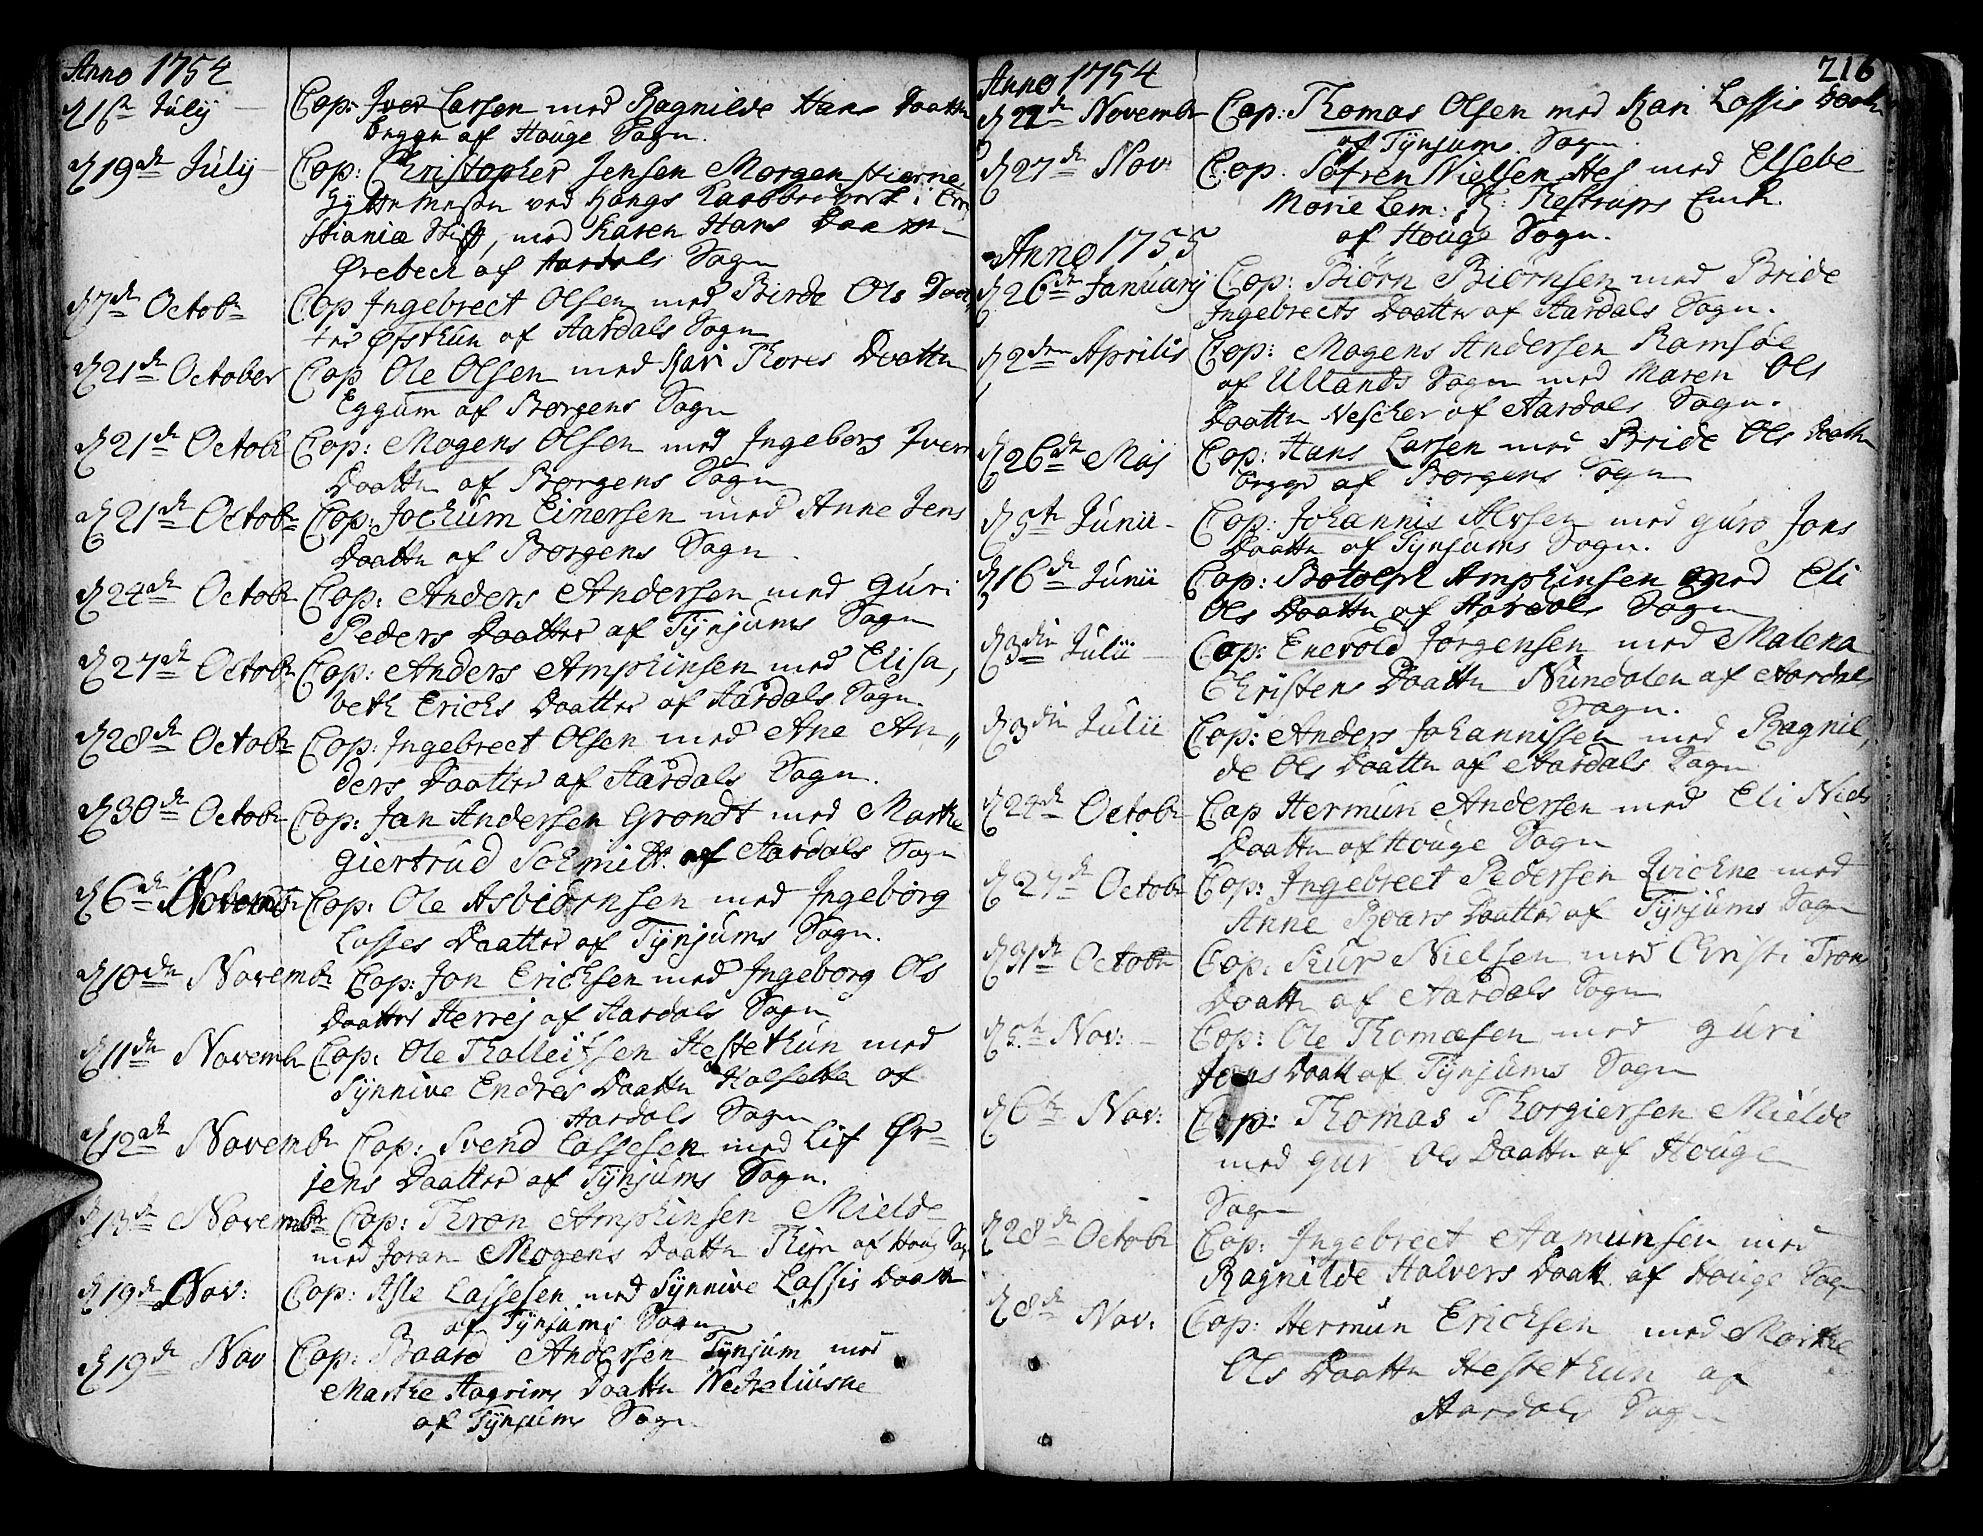 SAB, Lærdal sokneprestembete, Parish register (official) no. A 2, 1752-1782, p. 216